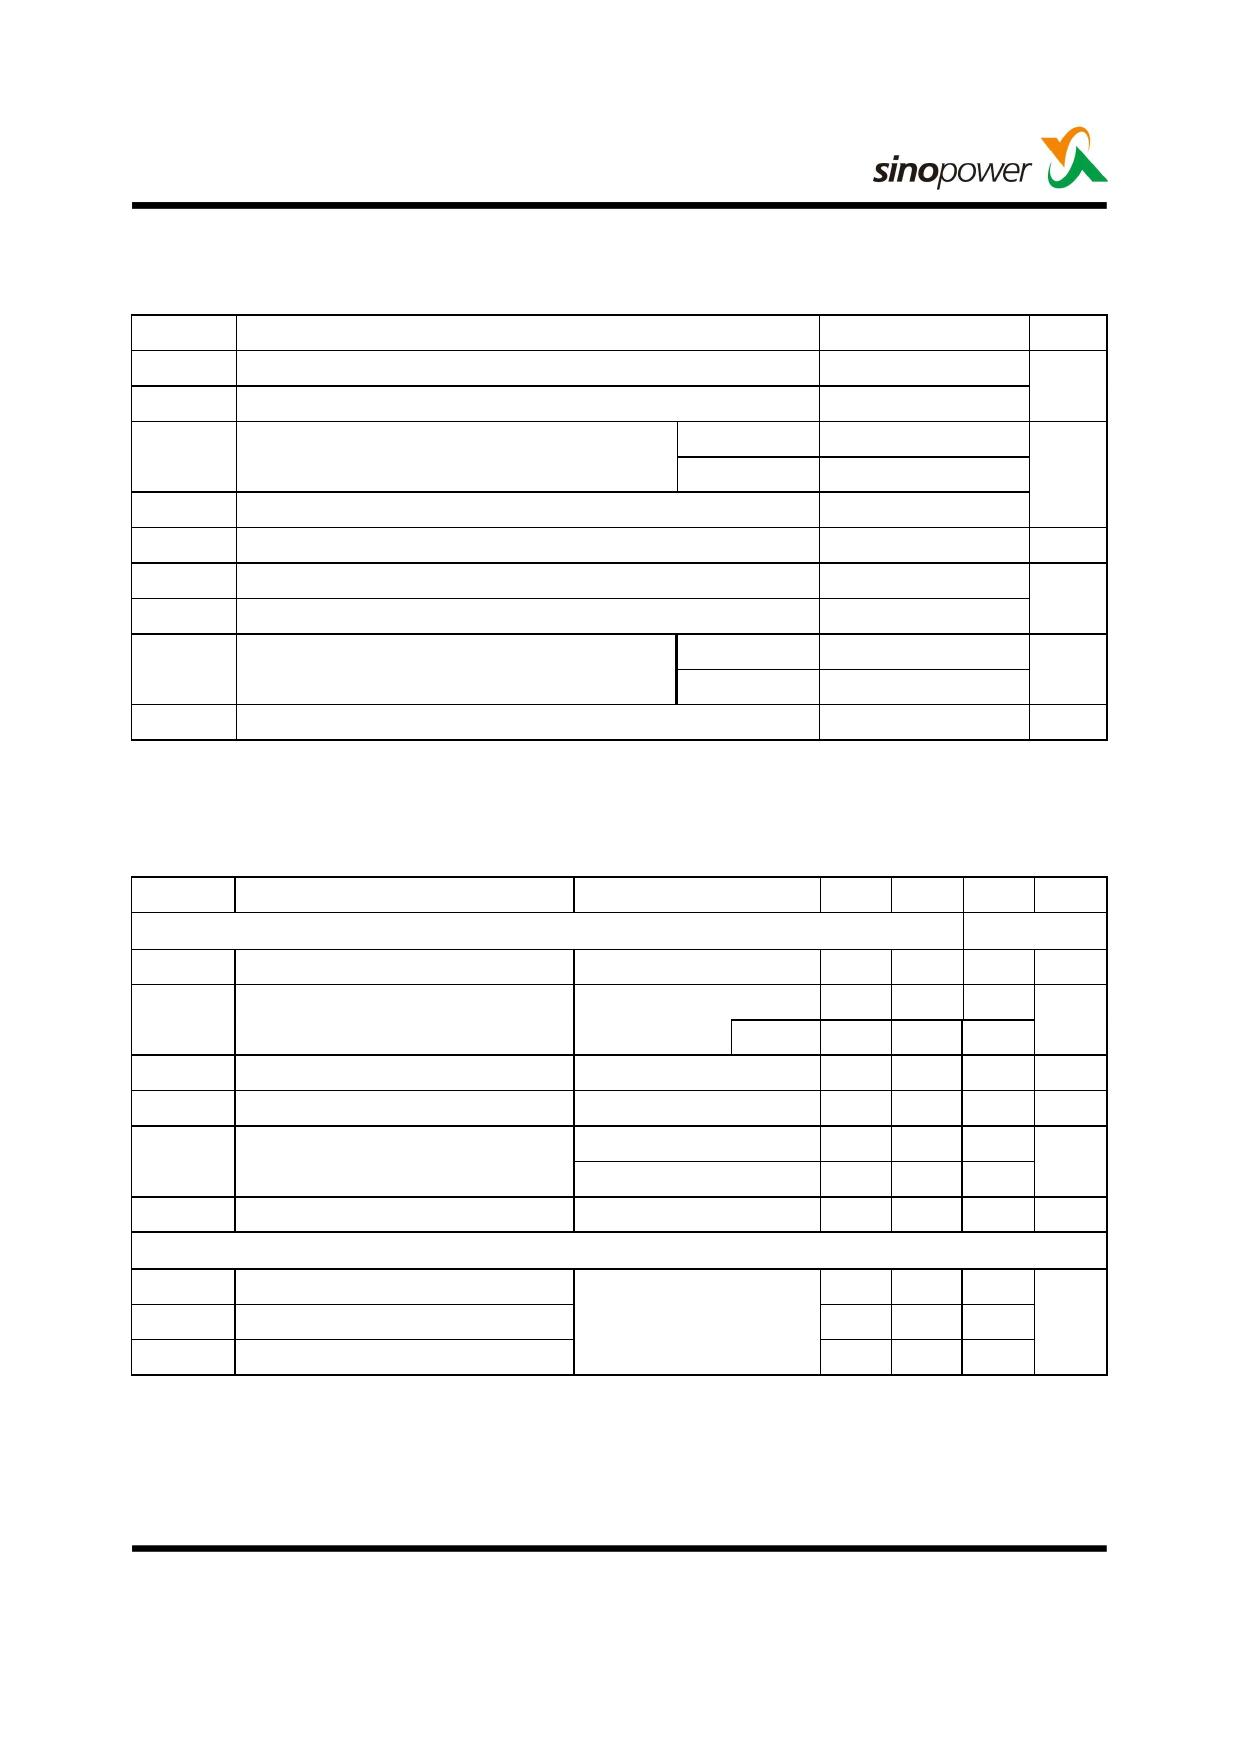 SM9926DSK pdf